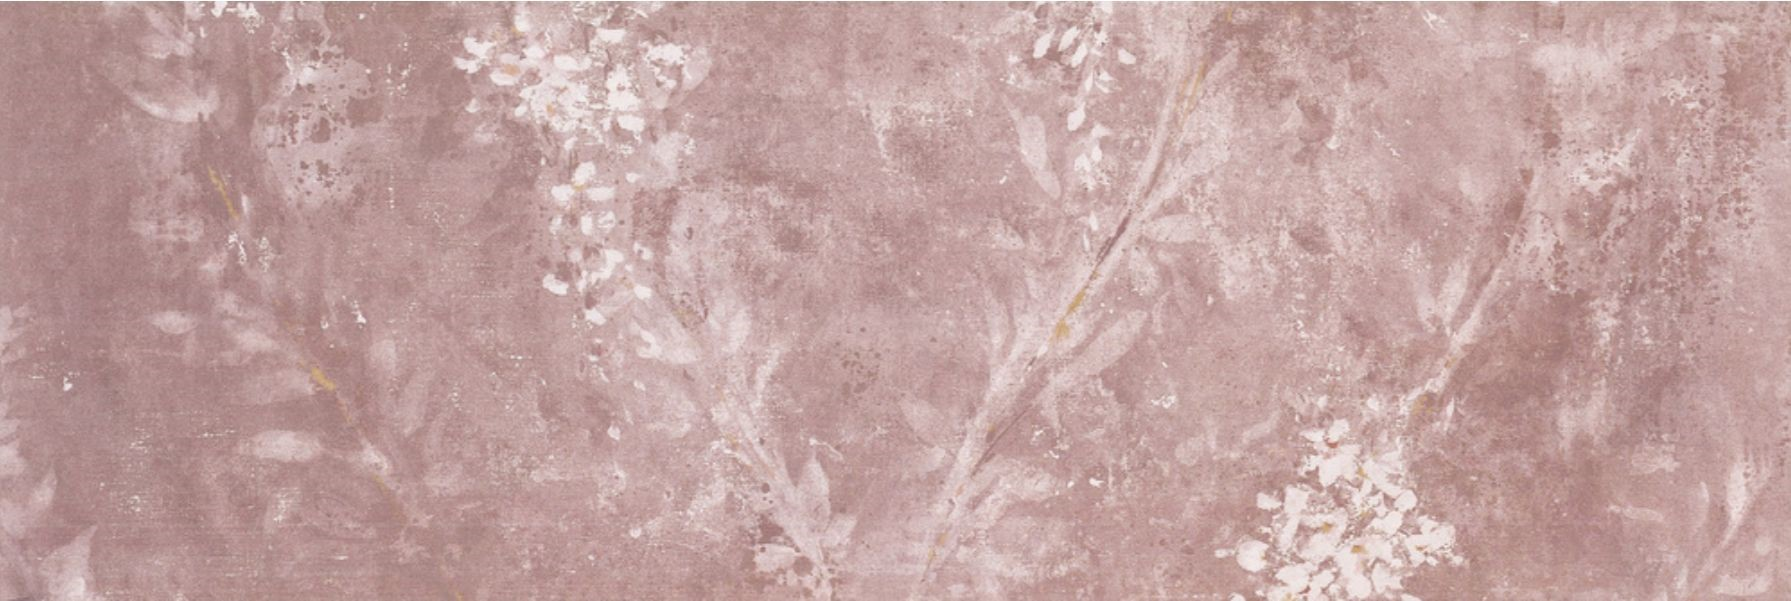 Obklad Aubergine Affresco Prowall 25x75 cm, matný